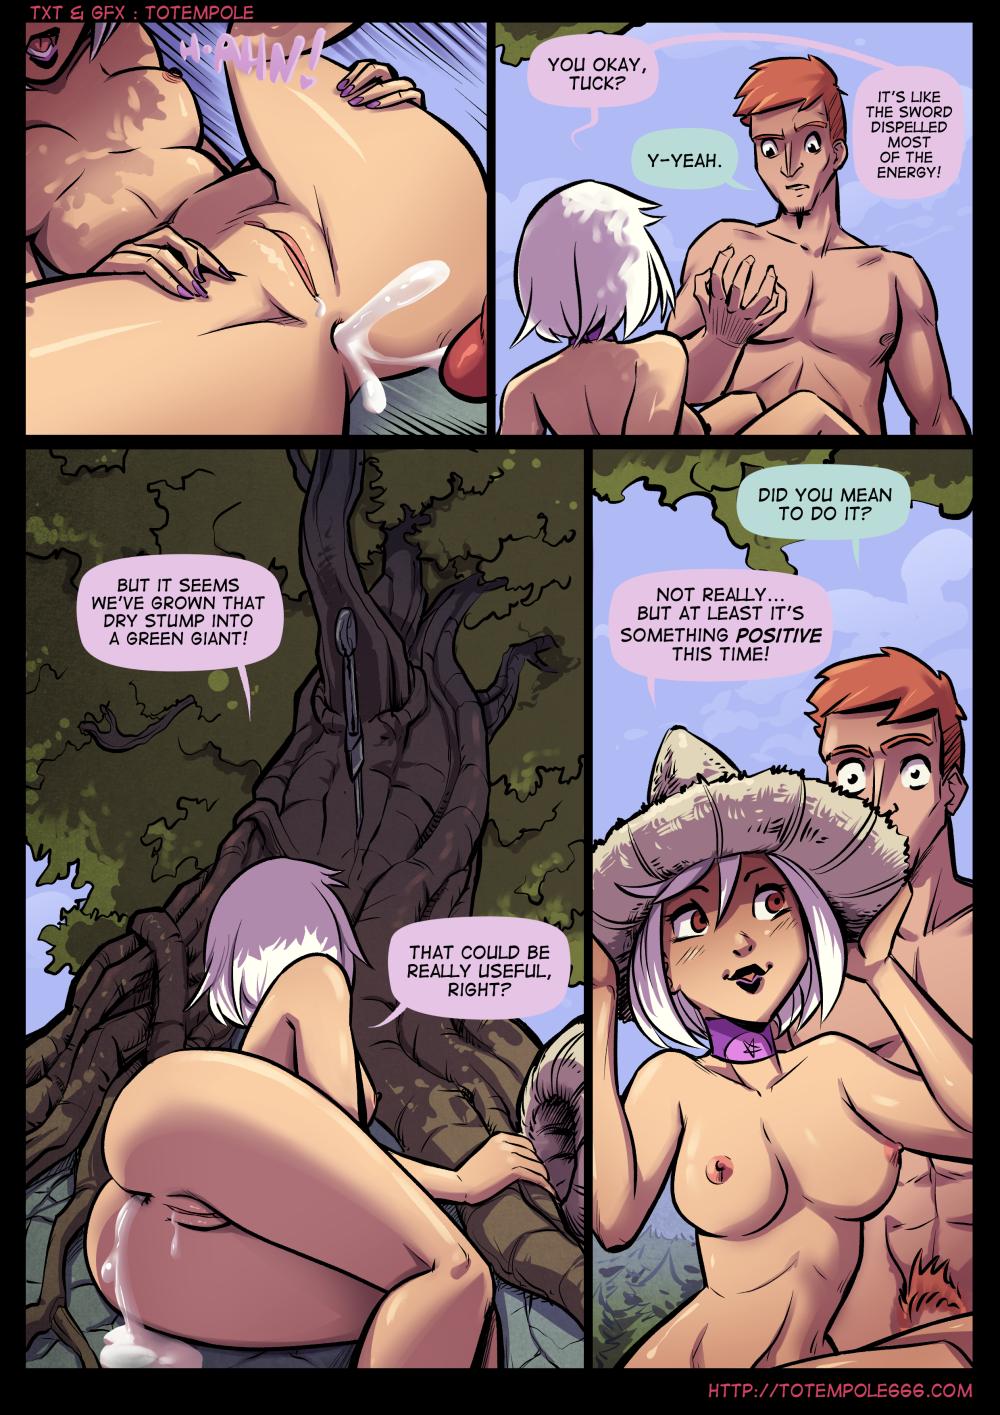 The Second Cumming #44